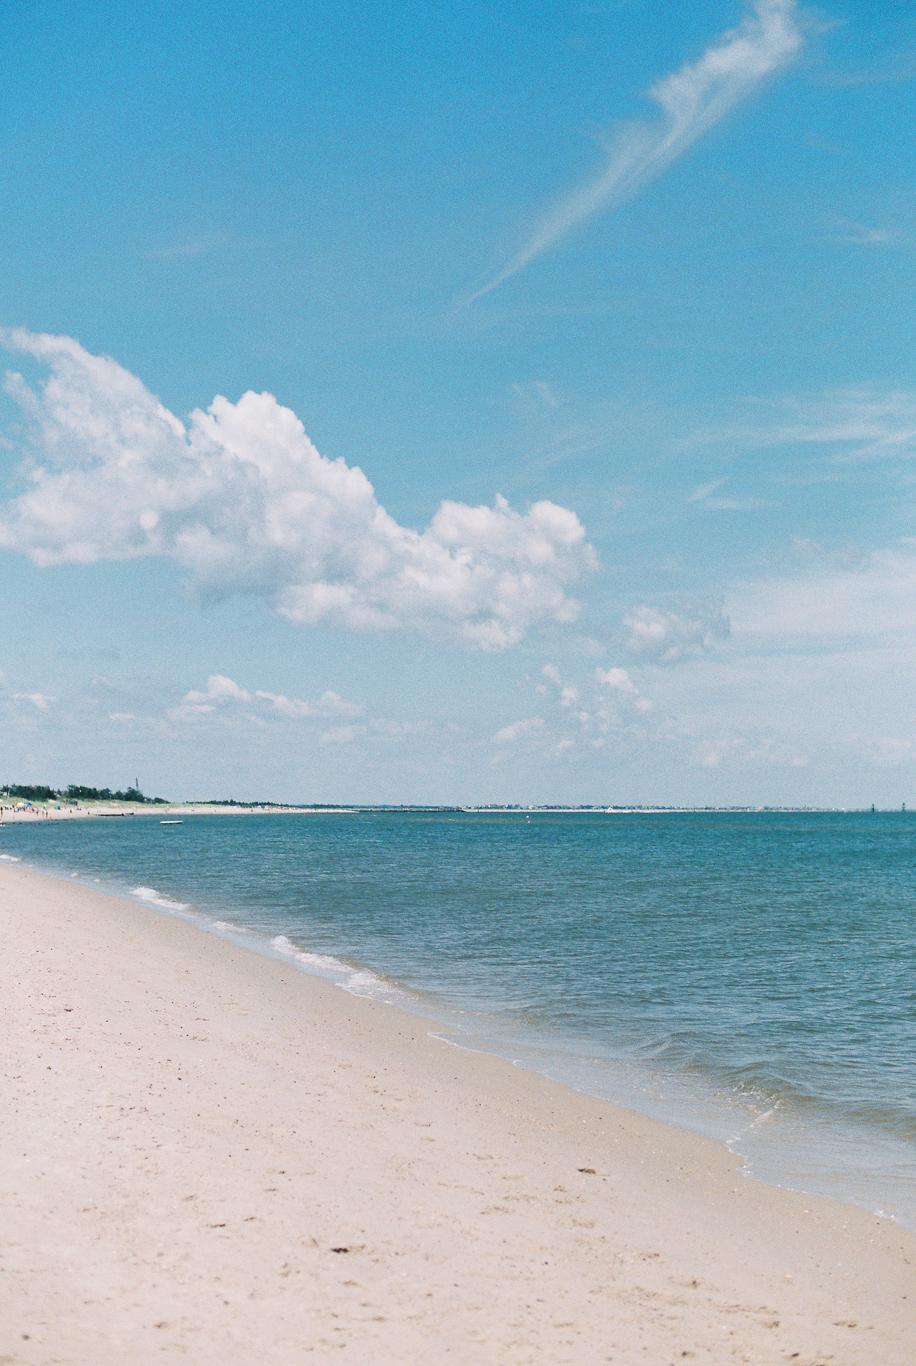 Maryland-delaware-photographer-BKLP-lifestyle-beach-lewes-rehobeth-funland-breanna kuhlmann-25.jpg